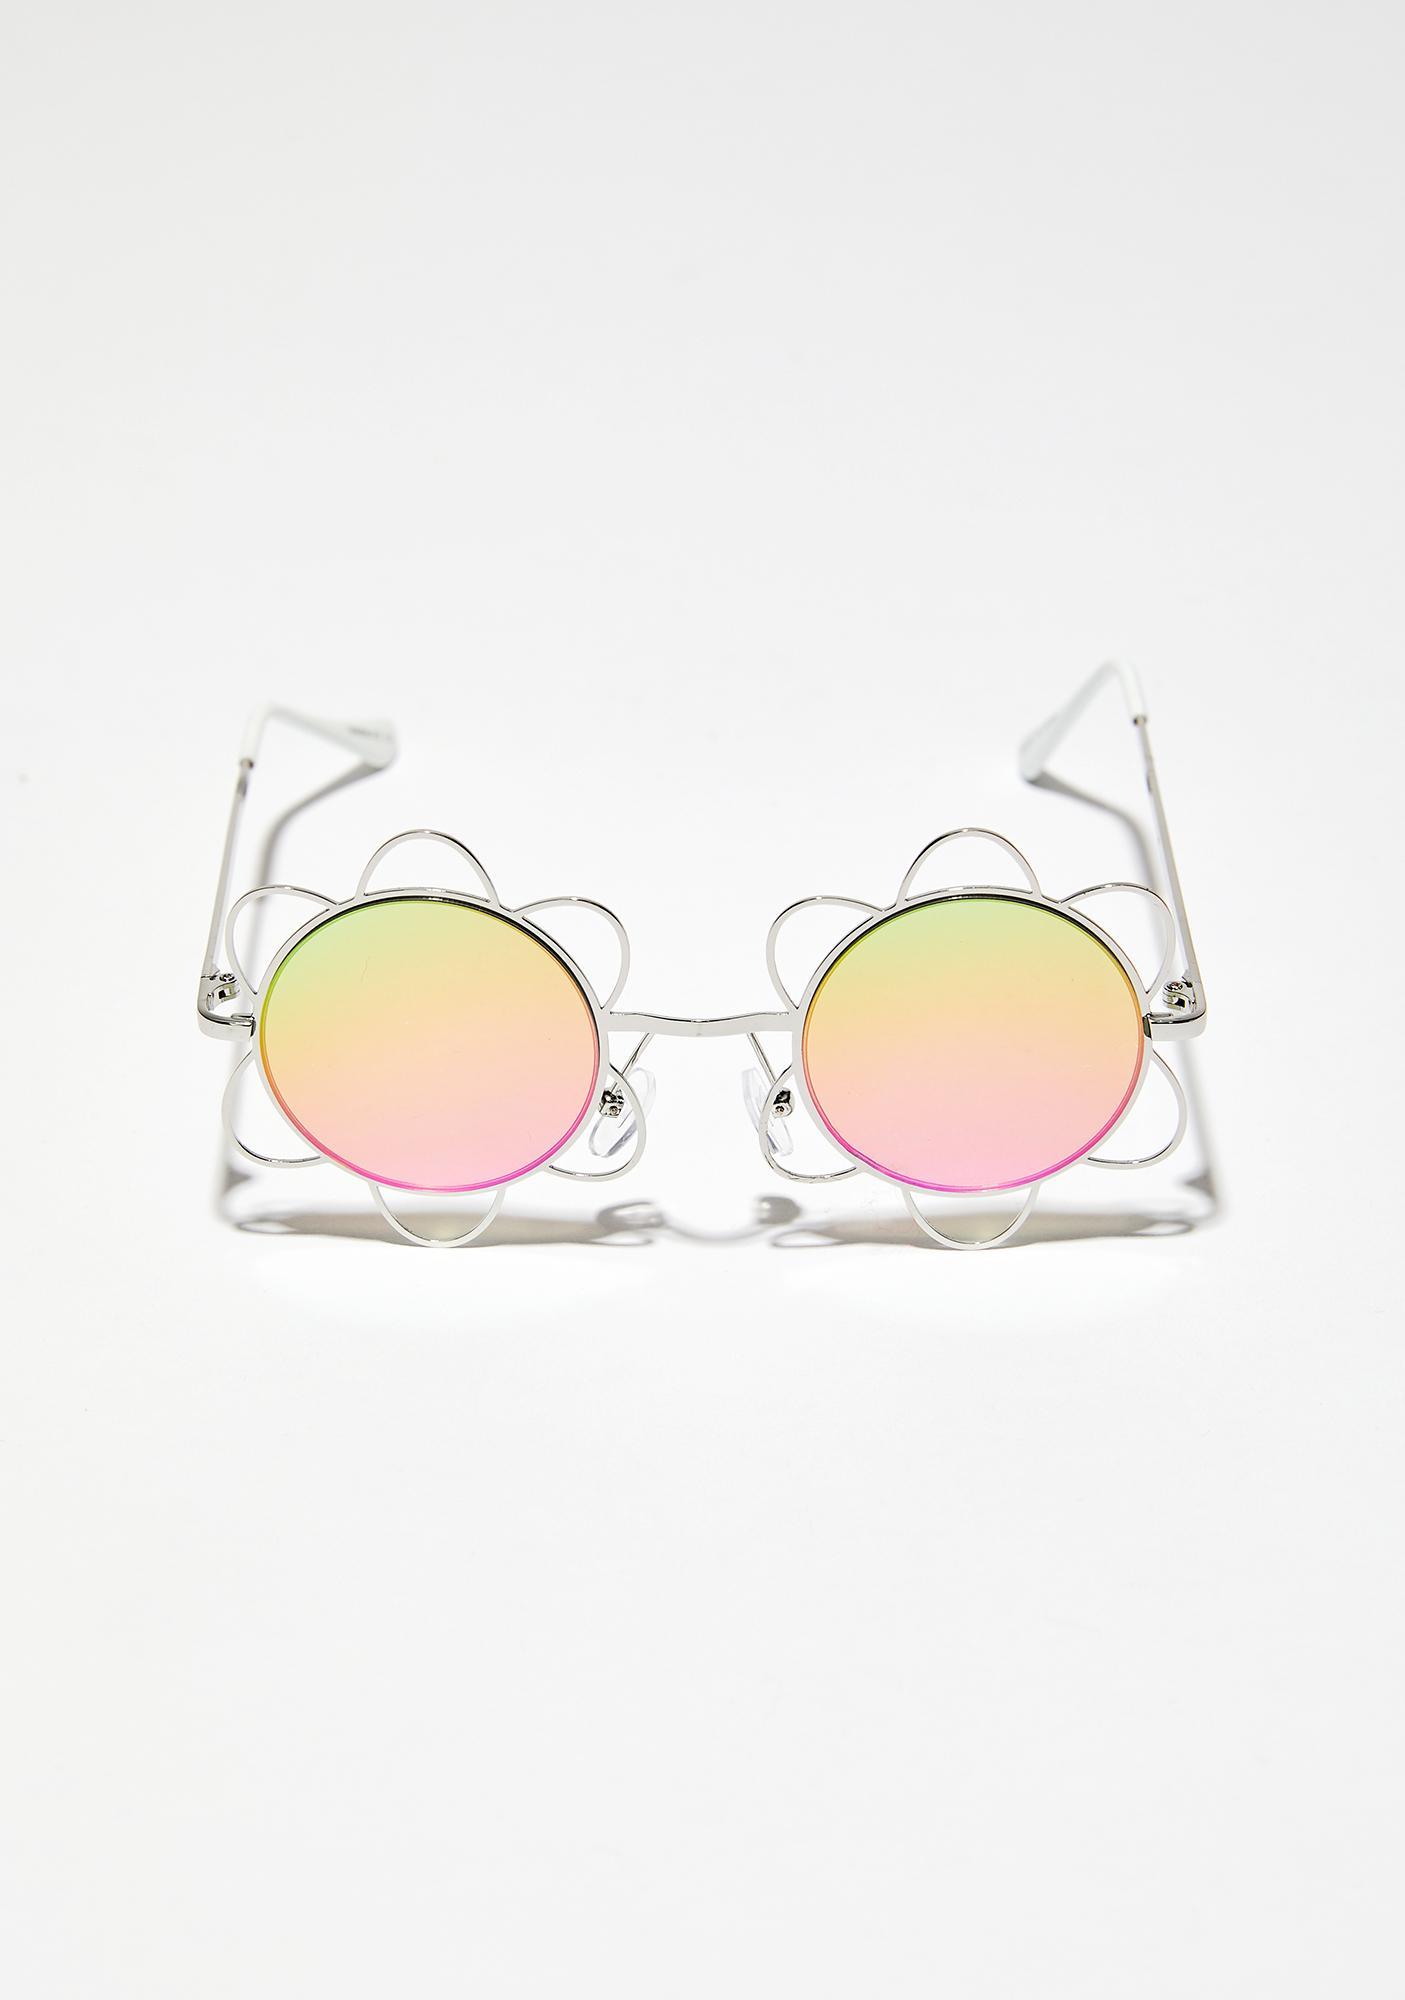 Skinnydip Delilah Sunglasses